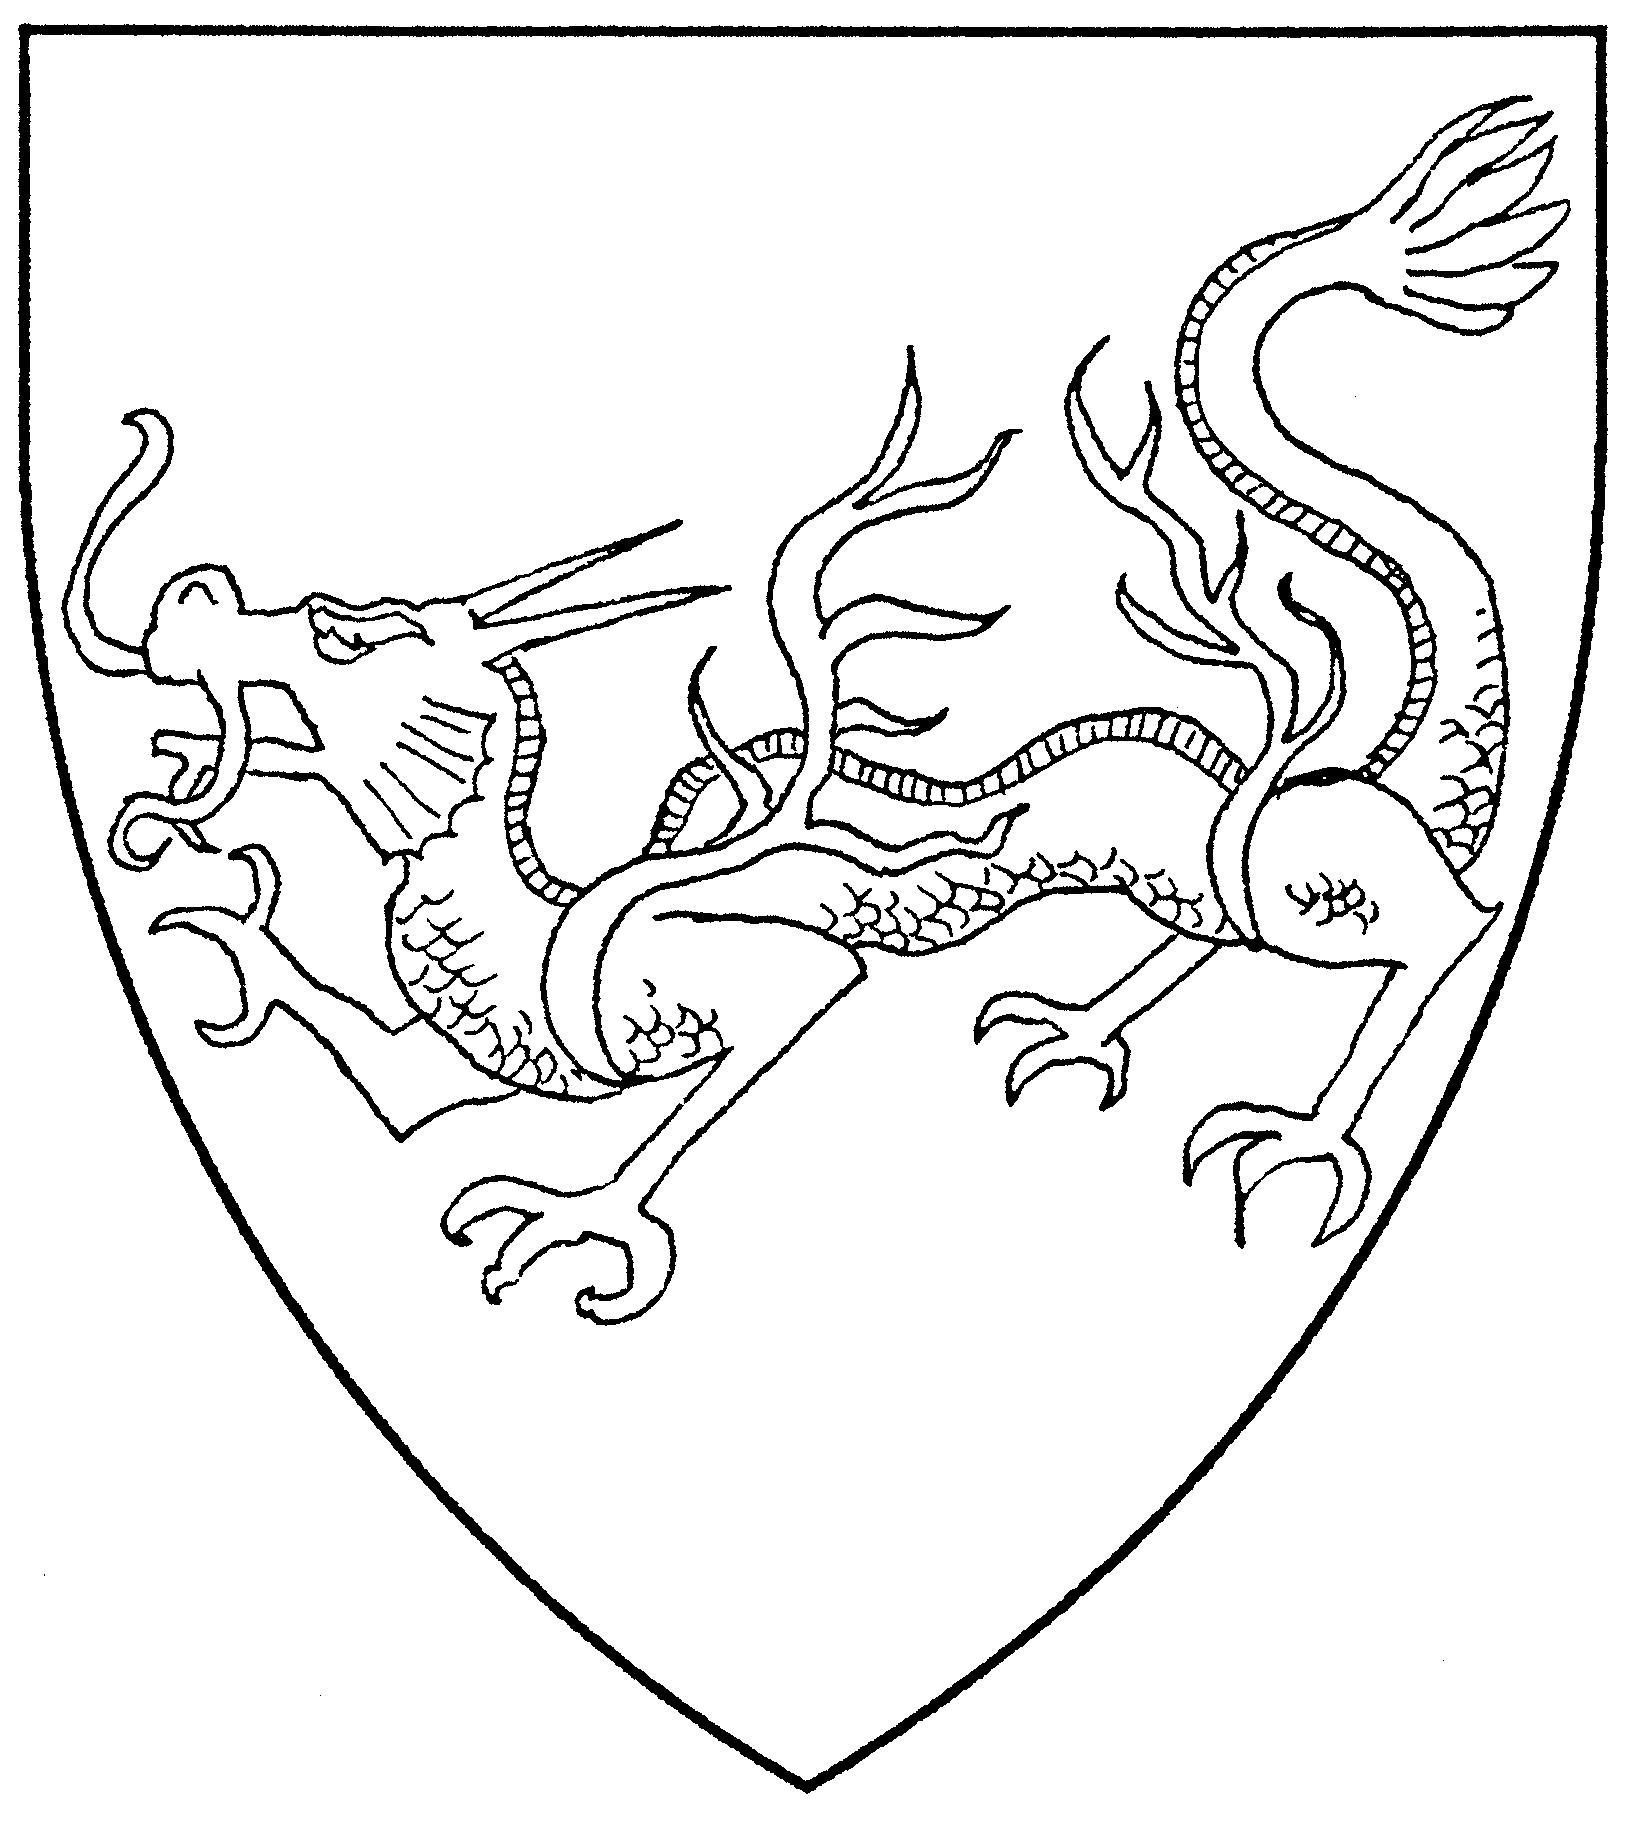 How to breed heraldic dragon - Oriental Dragon Passant Sfpp